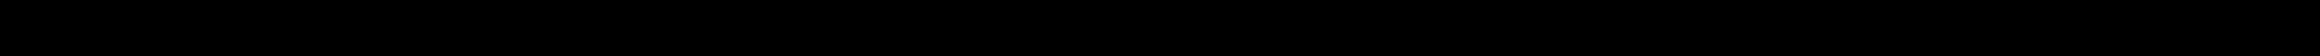 LuK M819939, MR253033 Urtrampningslager